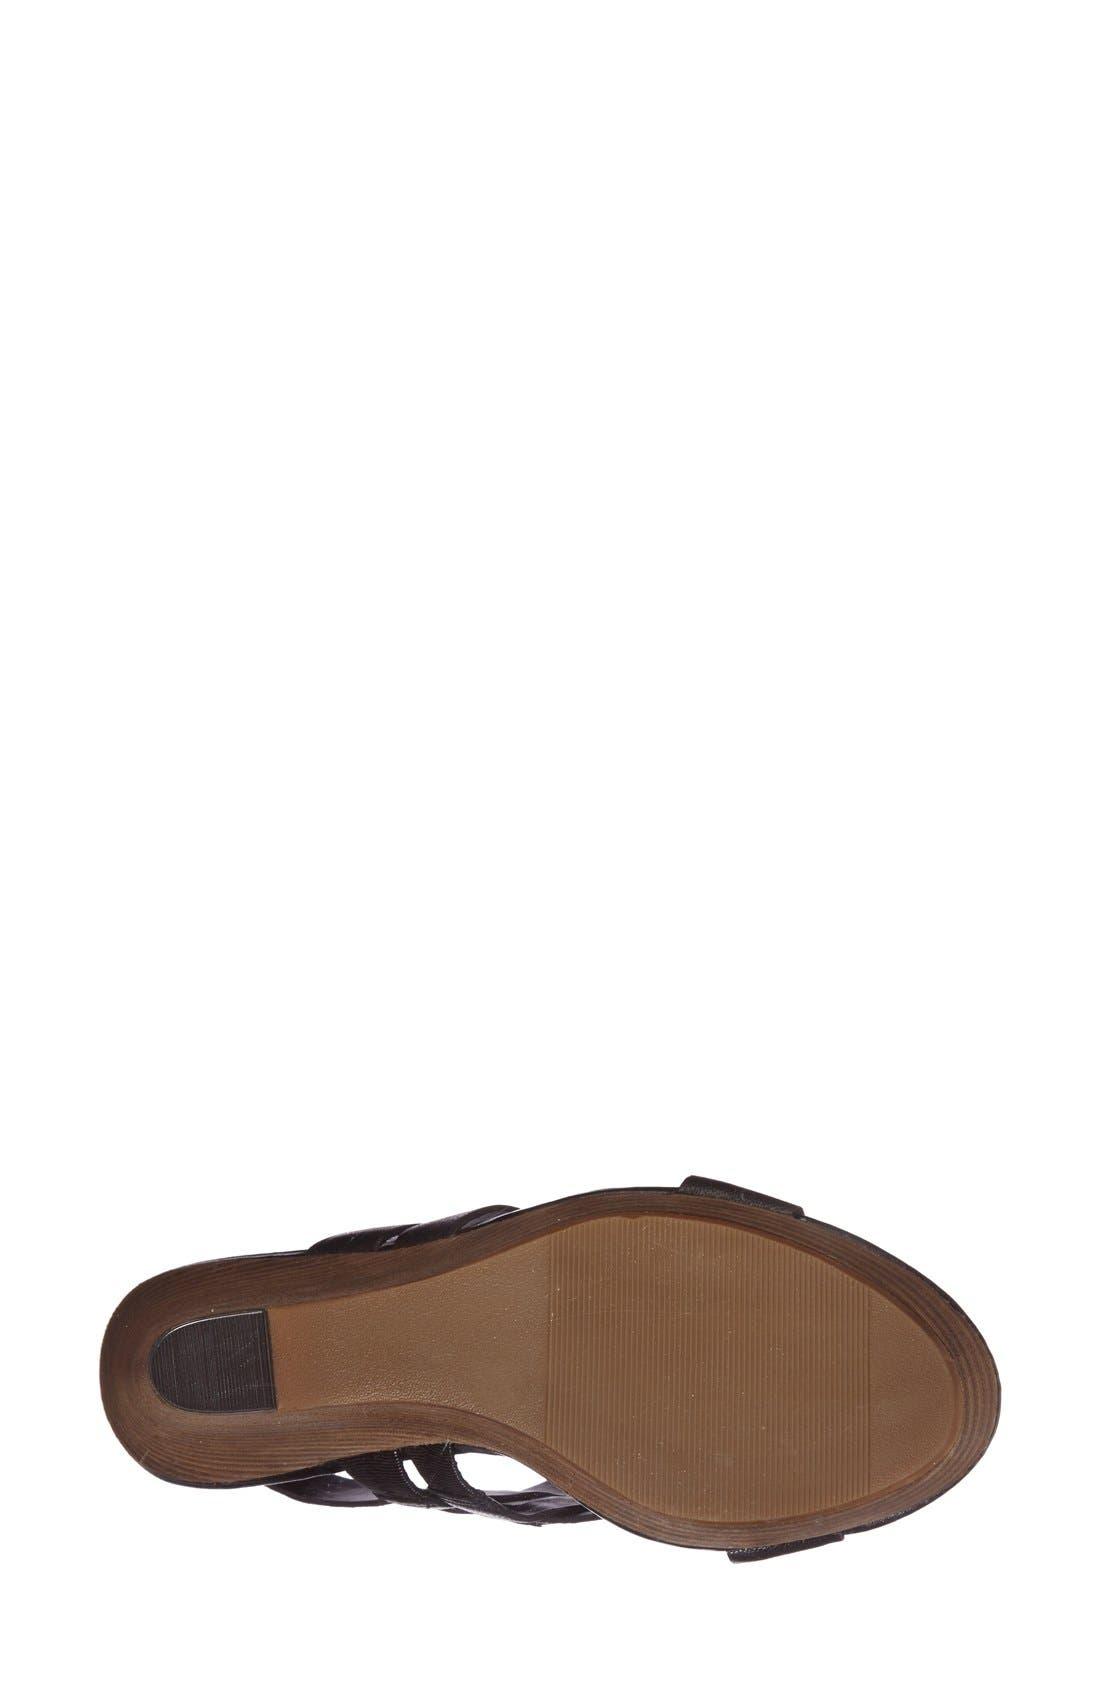 SOLE SOCIETY,                             'Jenny' Slingback Wedge Sandal,                             Alternate thumbnail 3, color,                             001